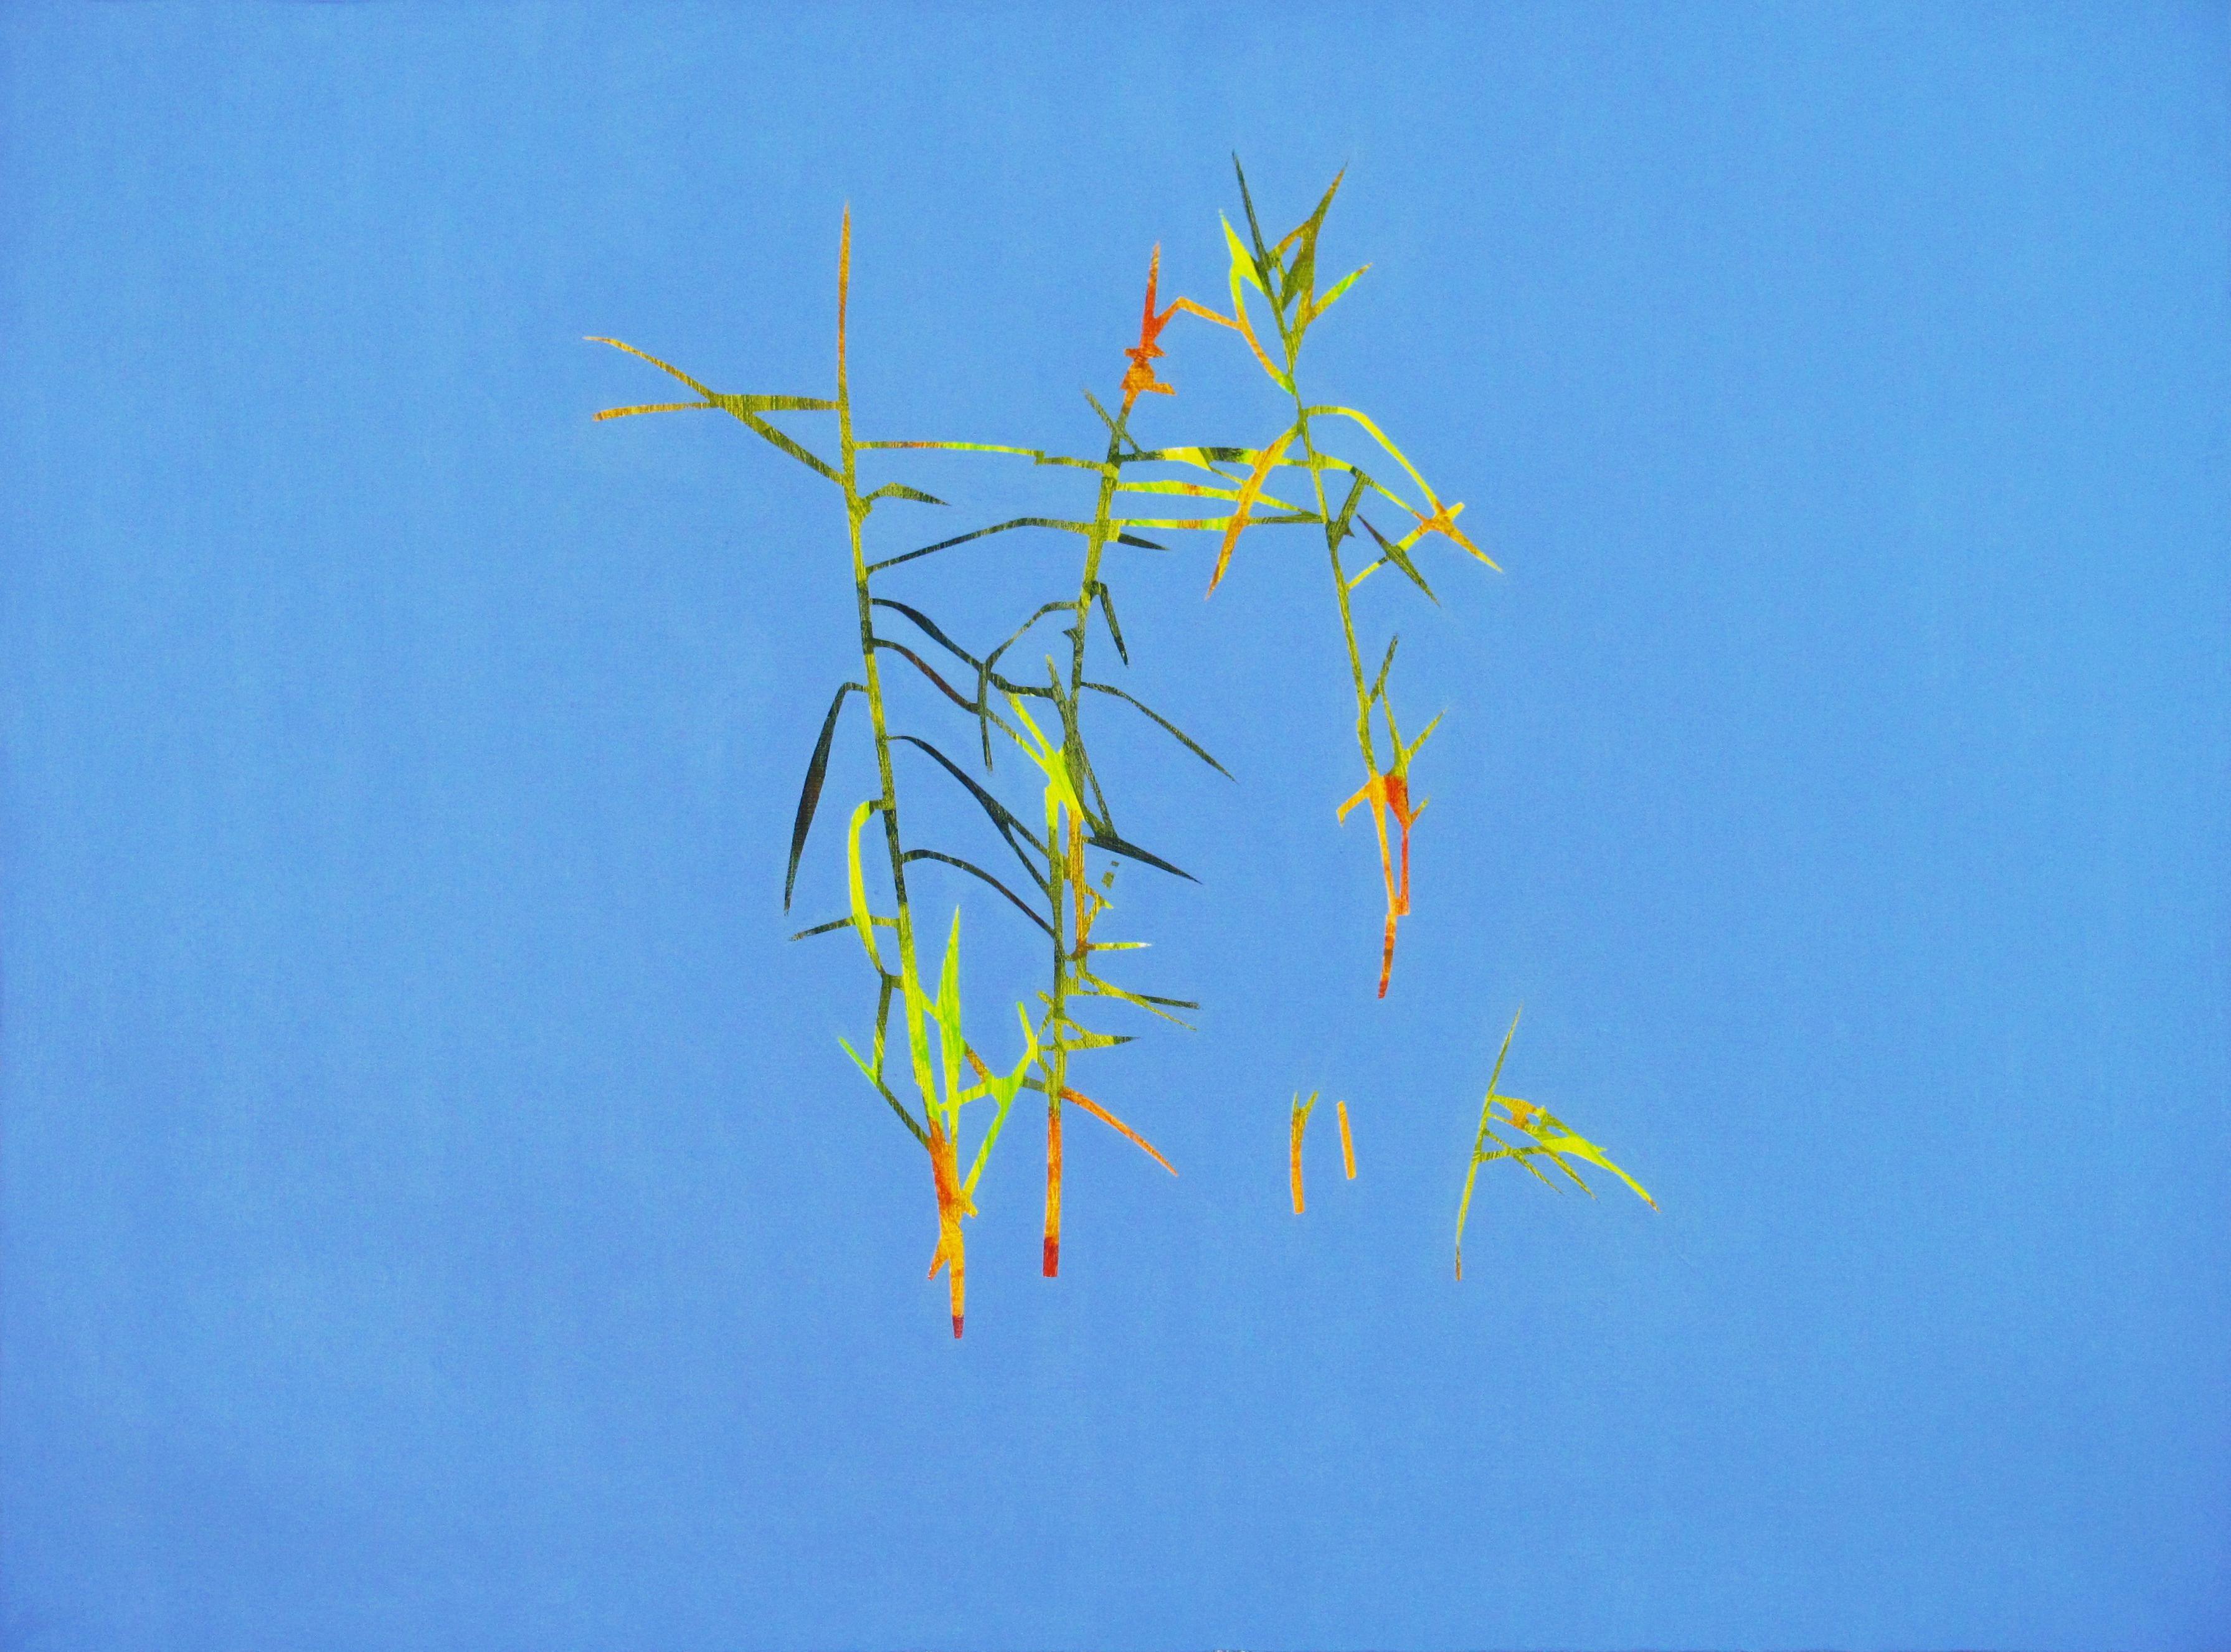 Reeds 28 September 13:42, Modern Landscape Oil Painting, Nature Lake, Minimalism